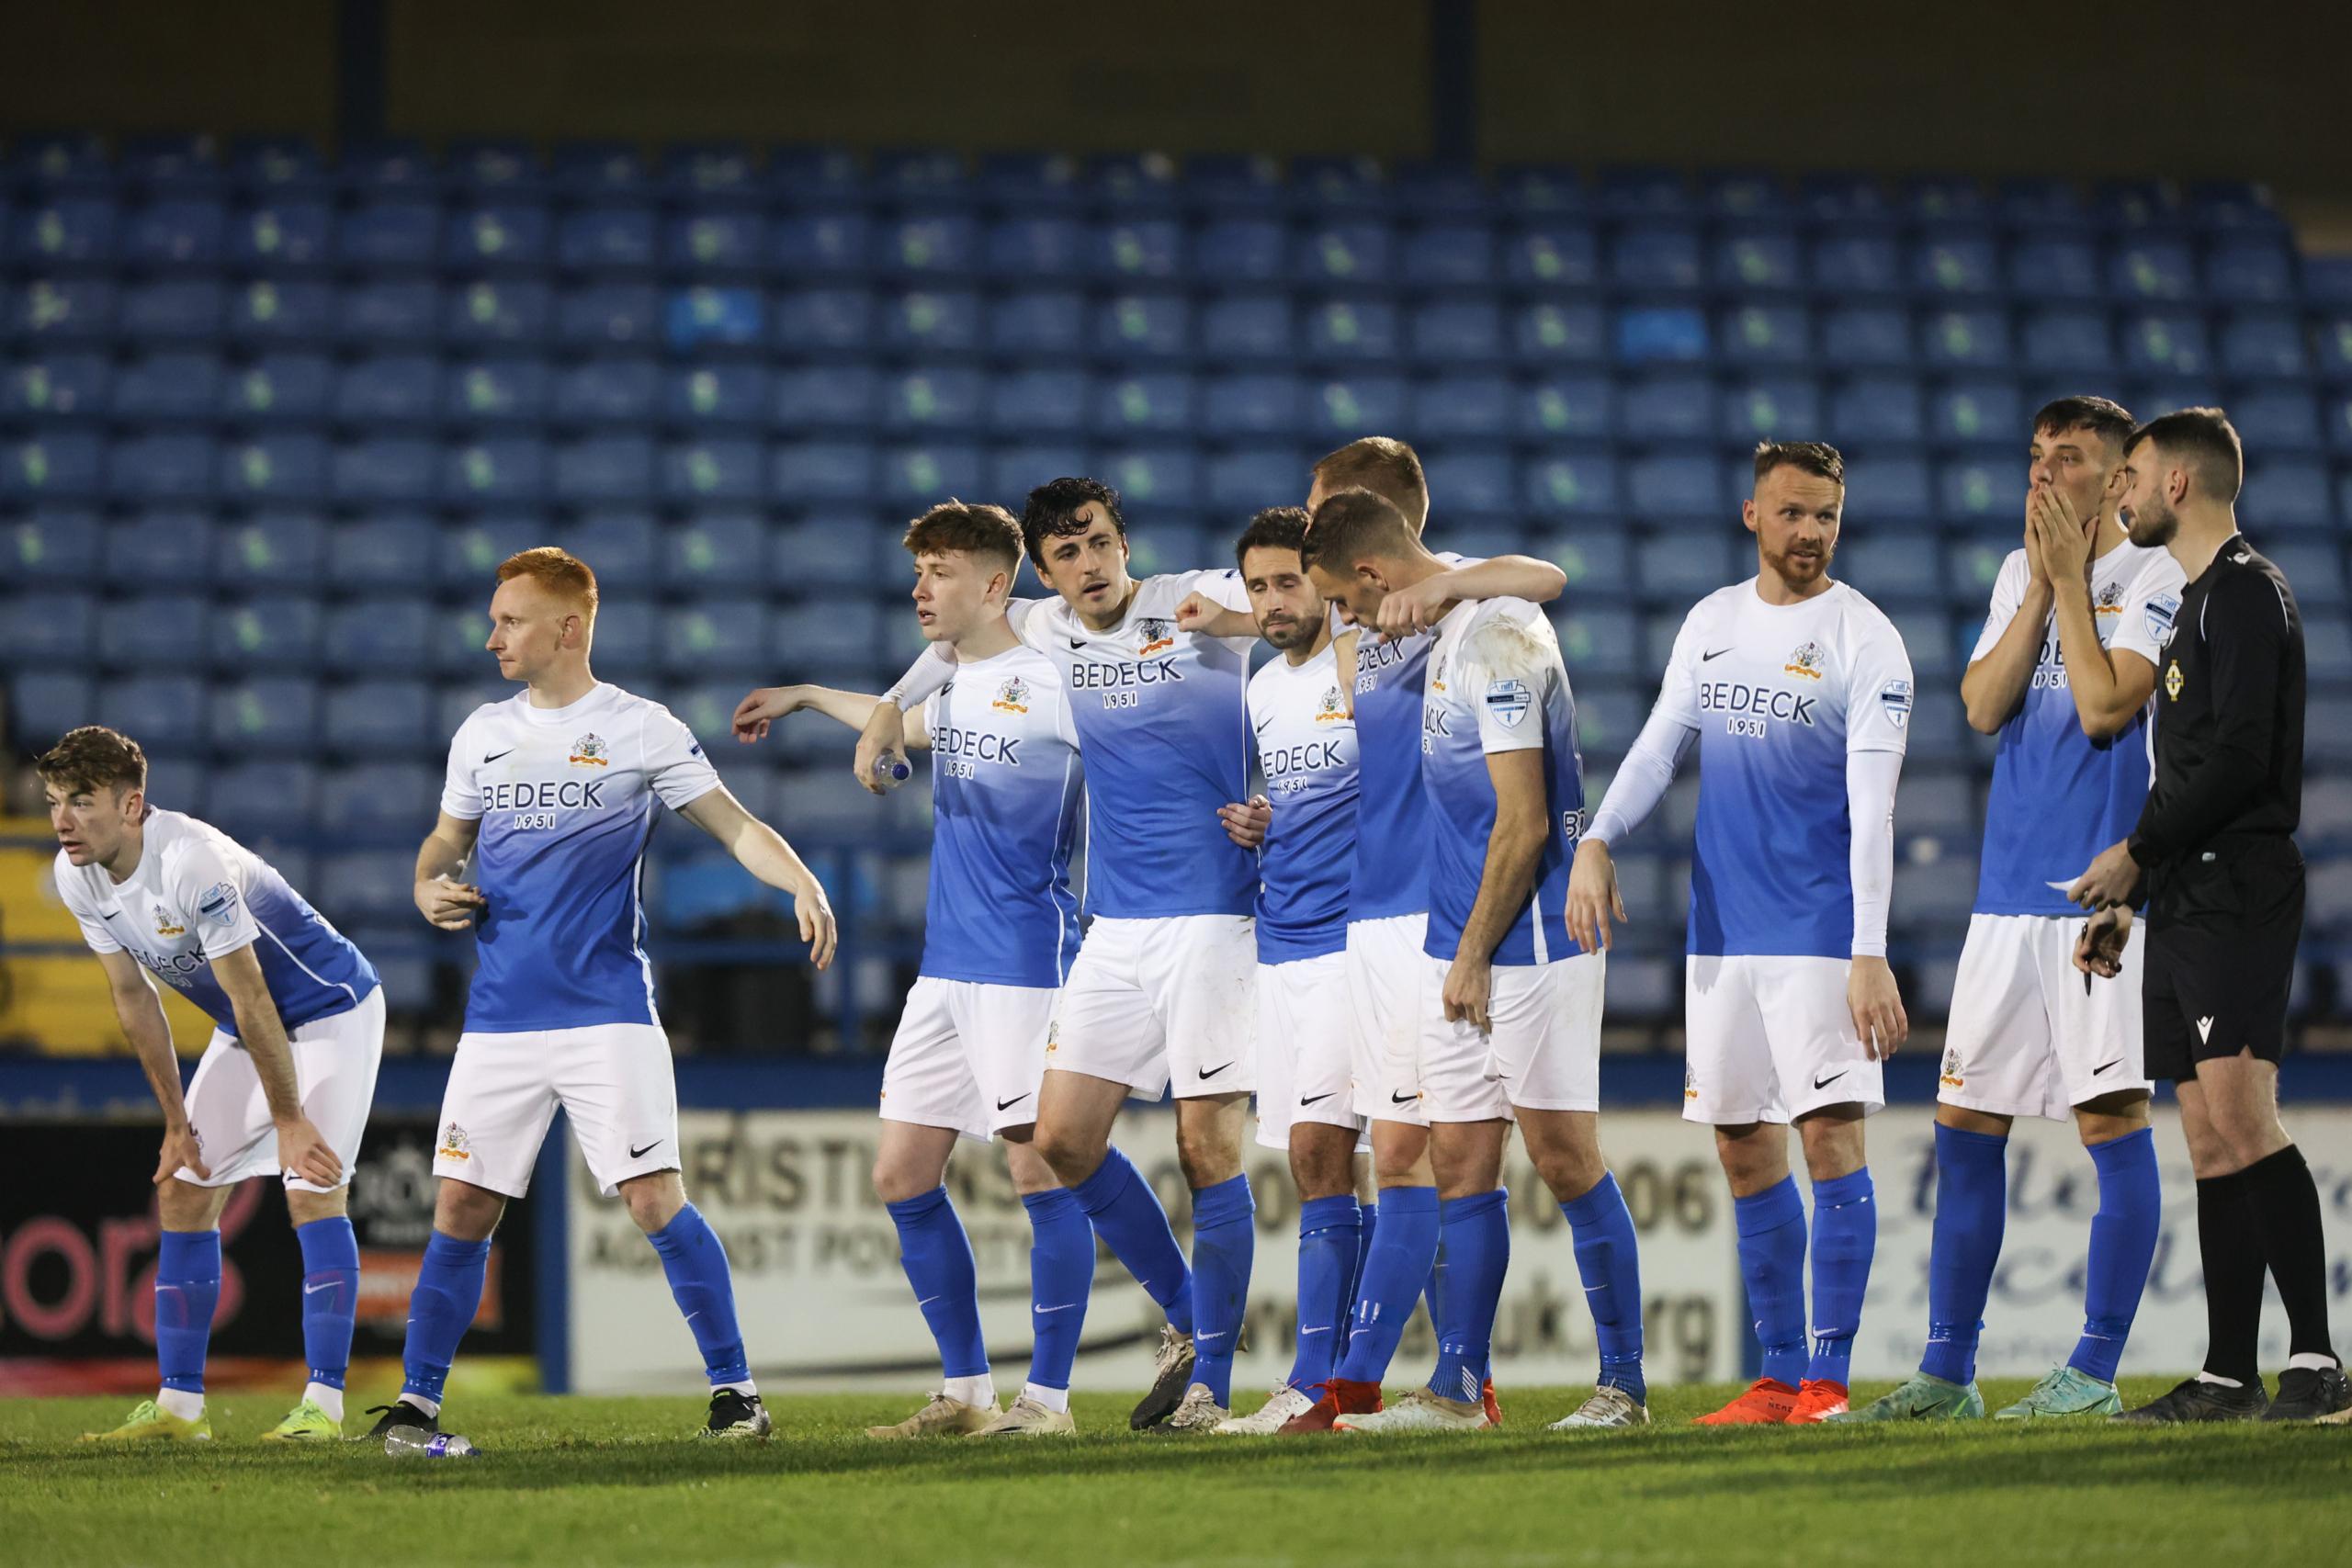 MATCH REPORT: Glenavon 2-2 Glentoran (Glentoran win 5-4 on penalties)